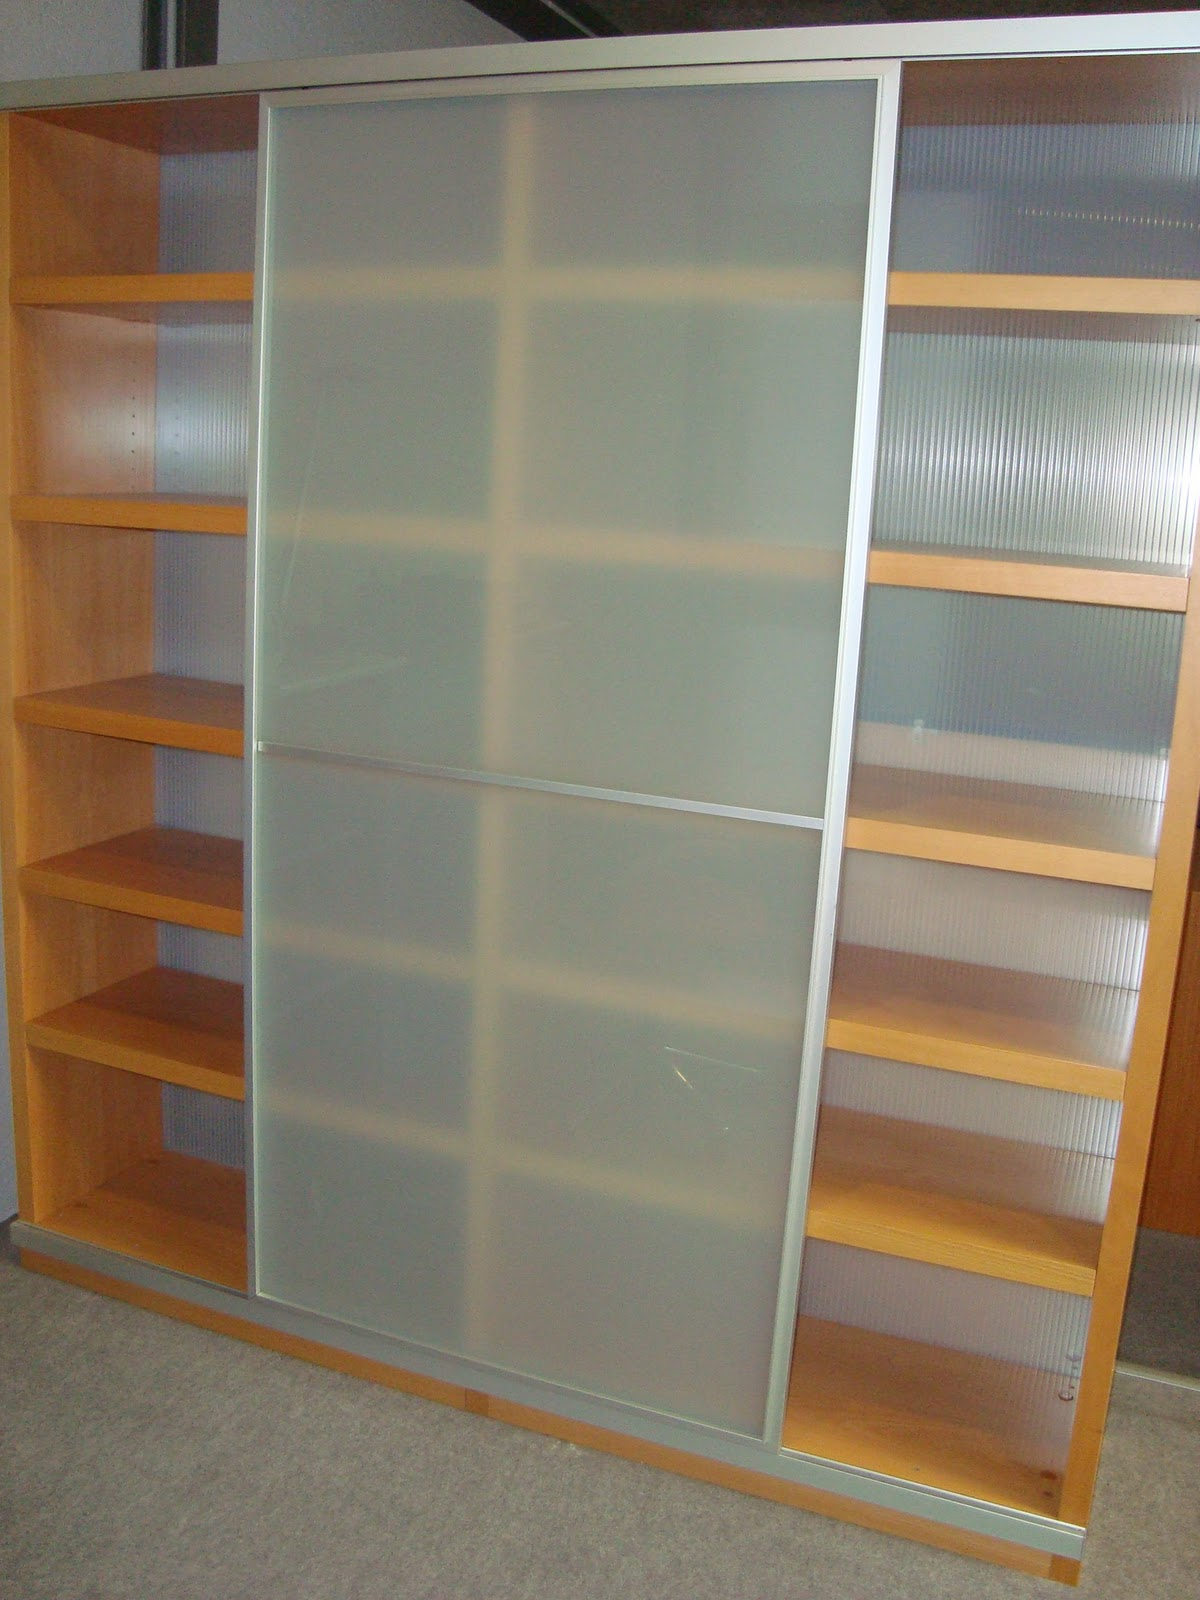 Liquidacion muebles de dise o estanterias librerias for Liquidacion de muebles